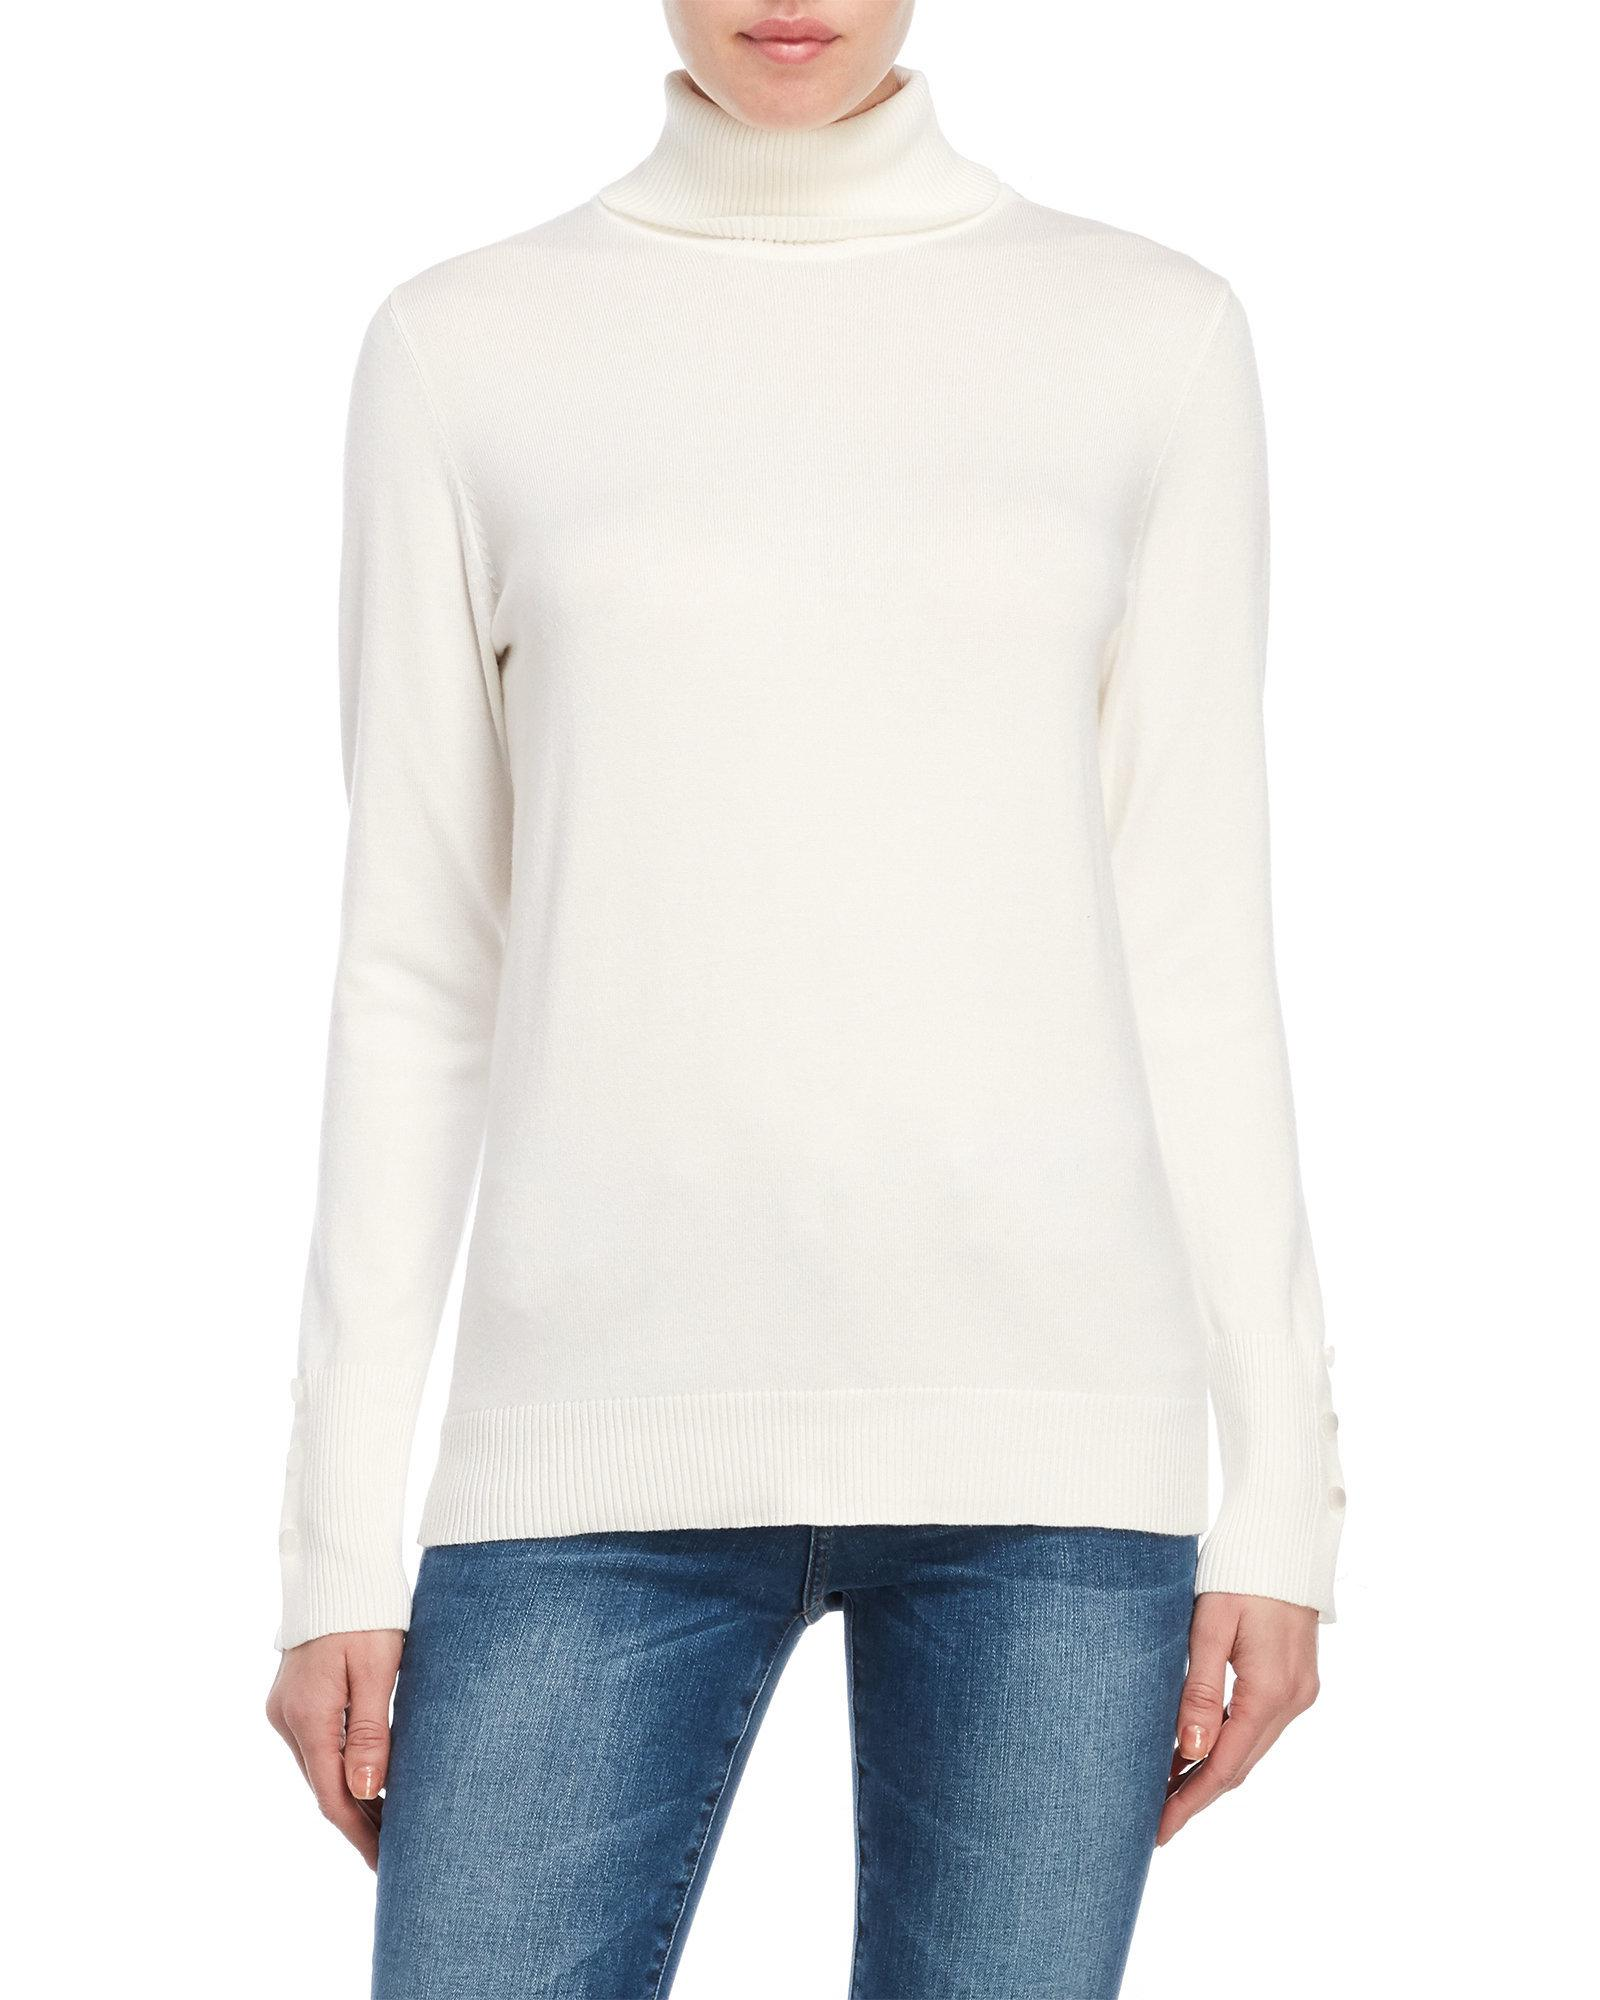 9a9cf66815f92 Lyst - Joseph A Button Cuff Turtleneck Sweater in White